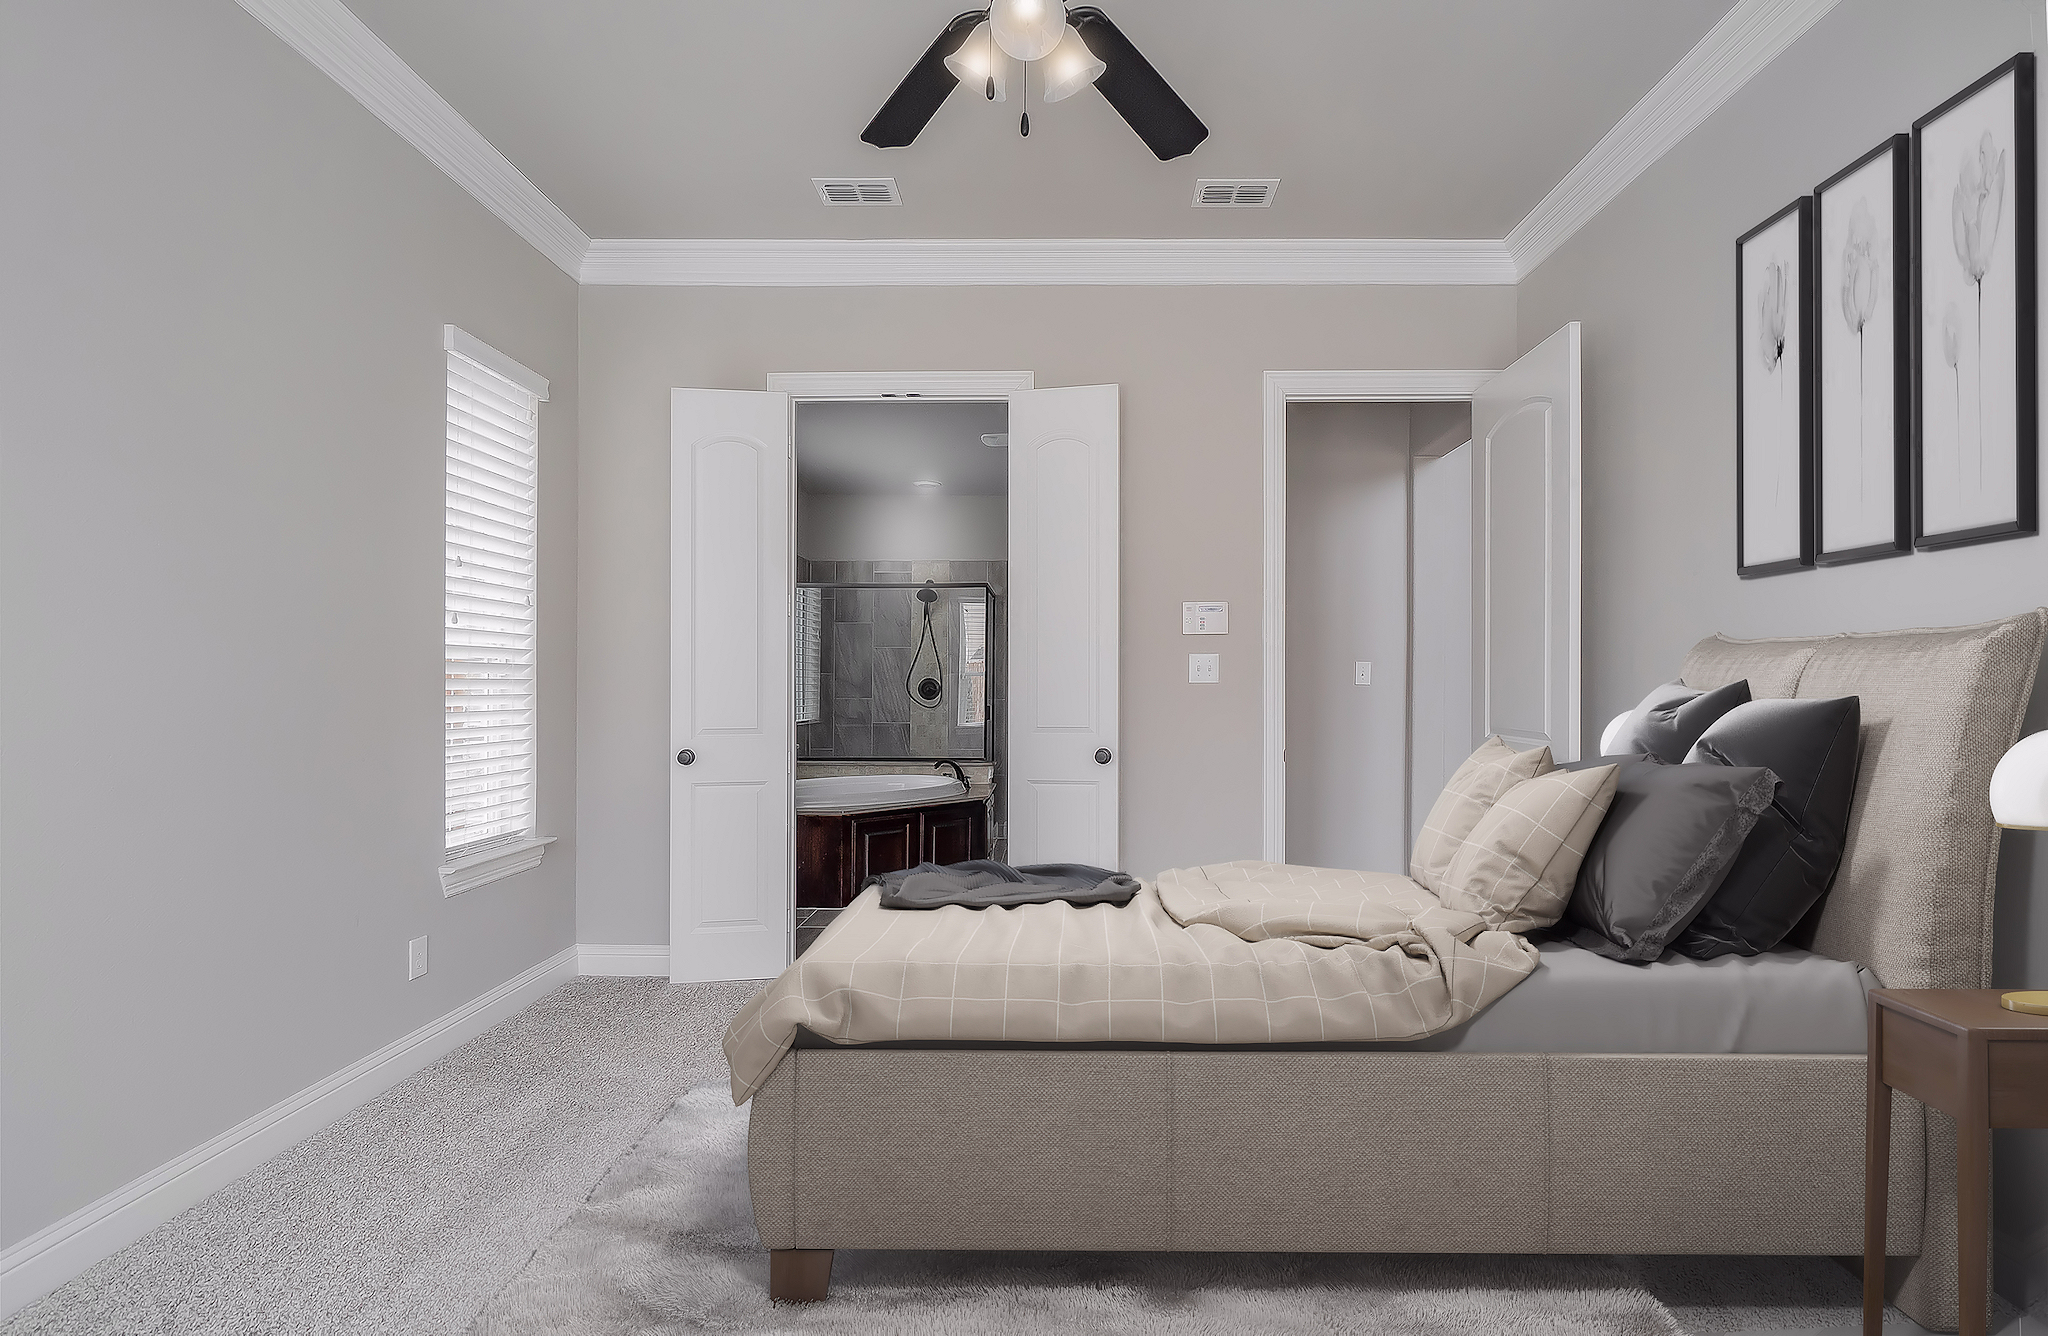 McKinney Real Estate Photography, Photographer, Virtual Staging (4).jpg